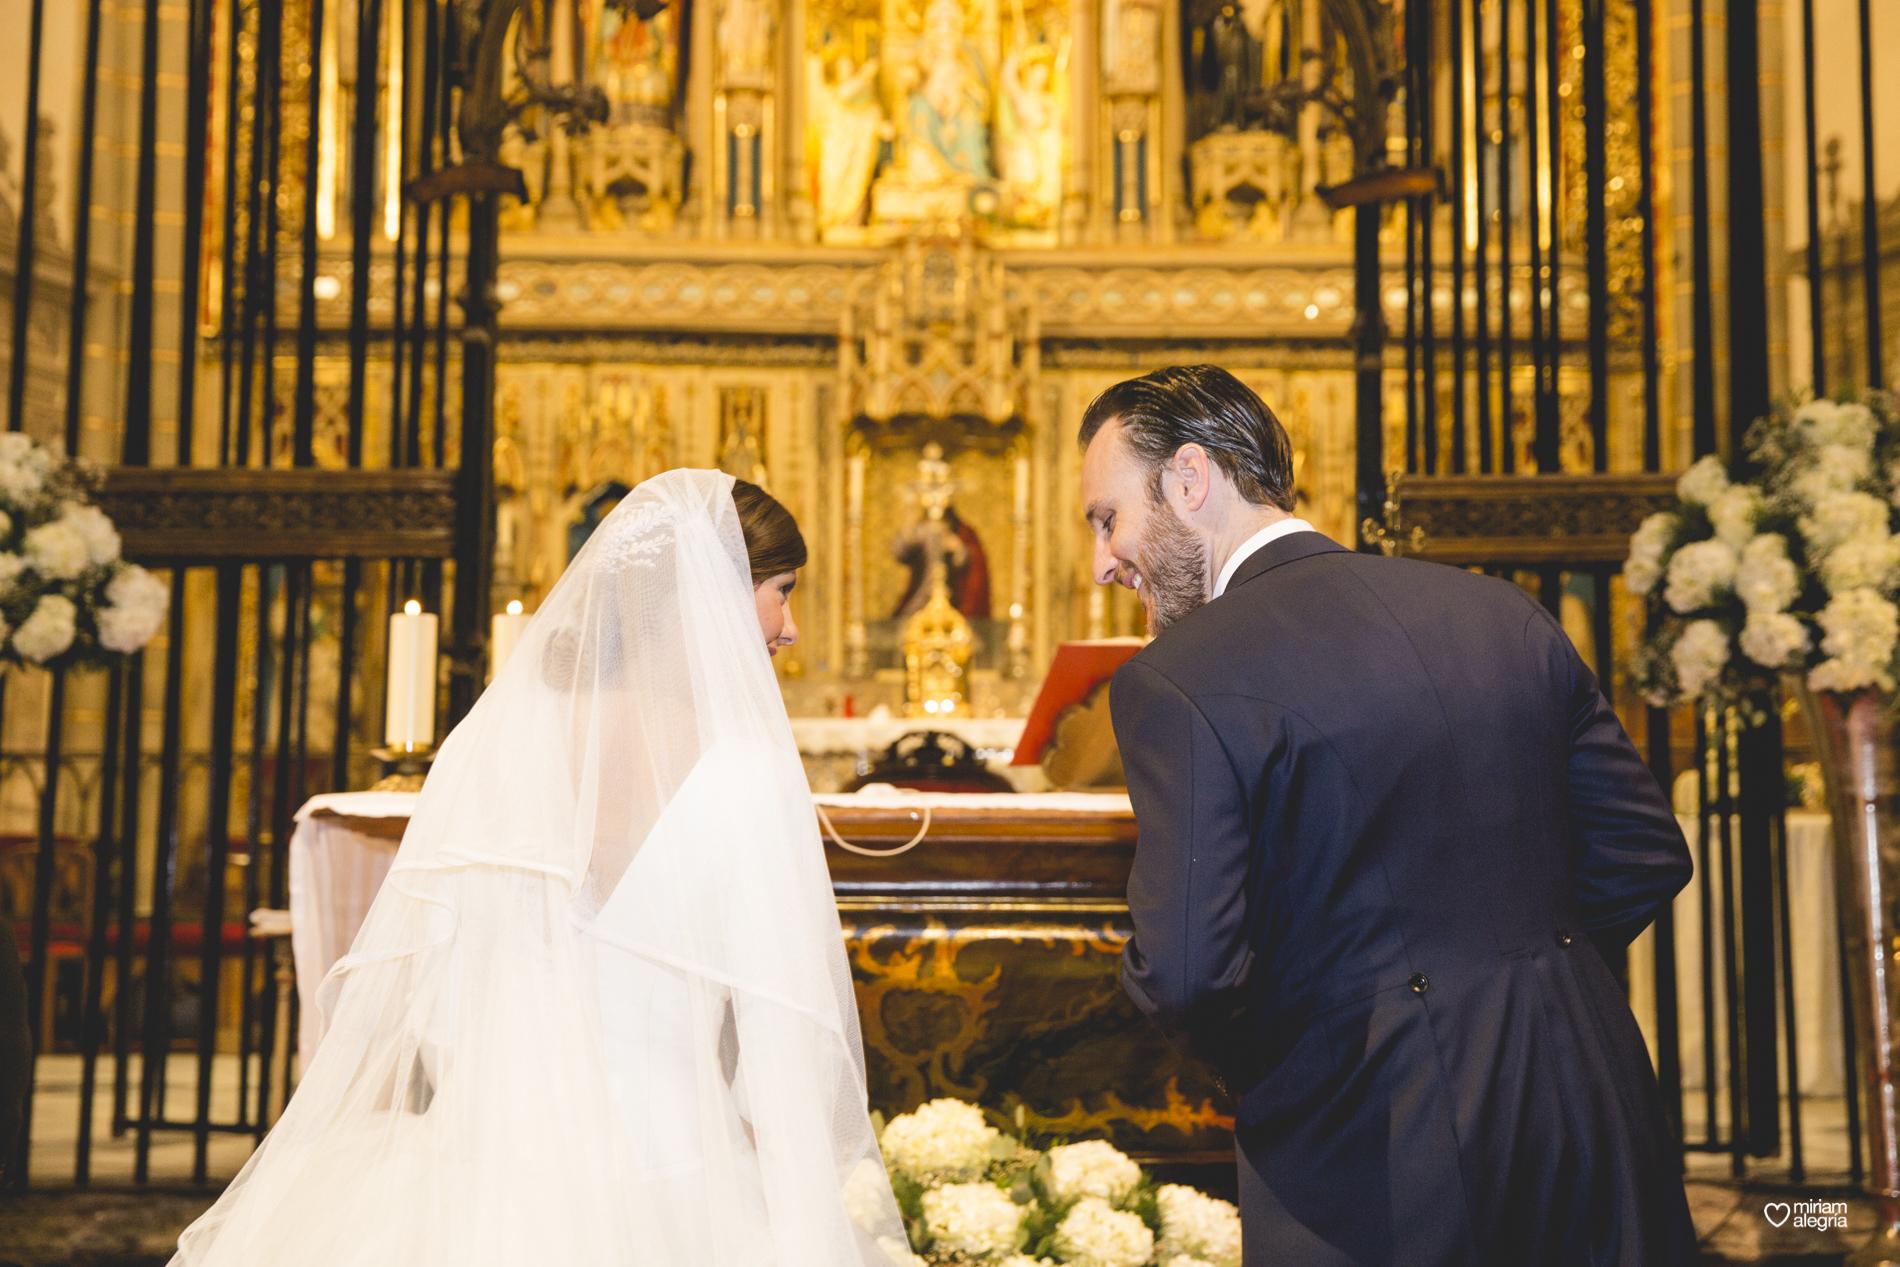 boda-en-la-catedral-de-murcia-miriam-alegria-fotografos-boda-murcia-38